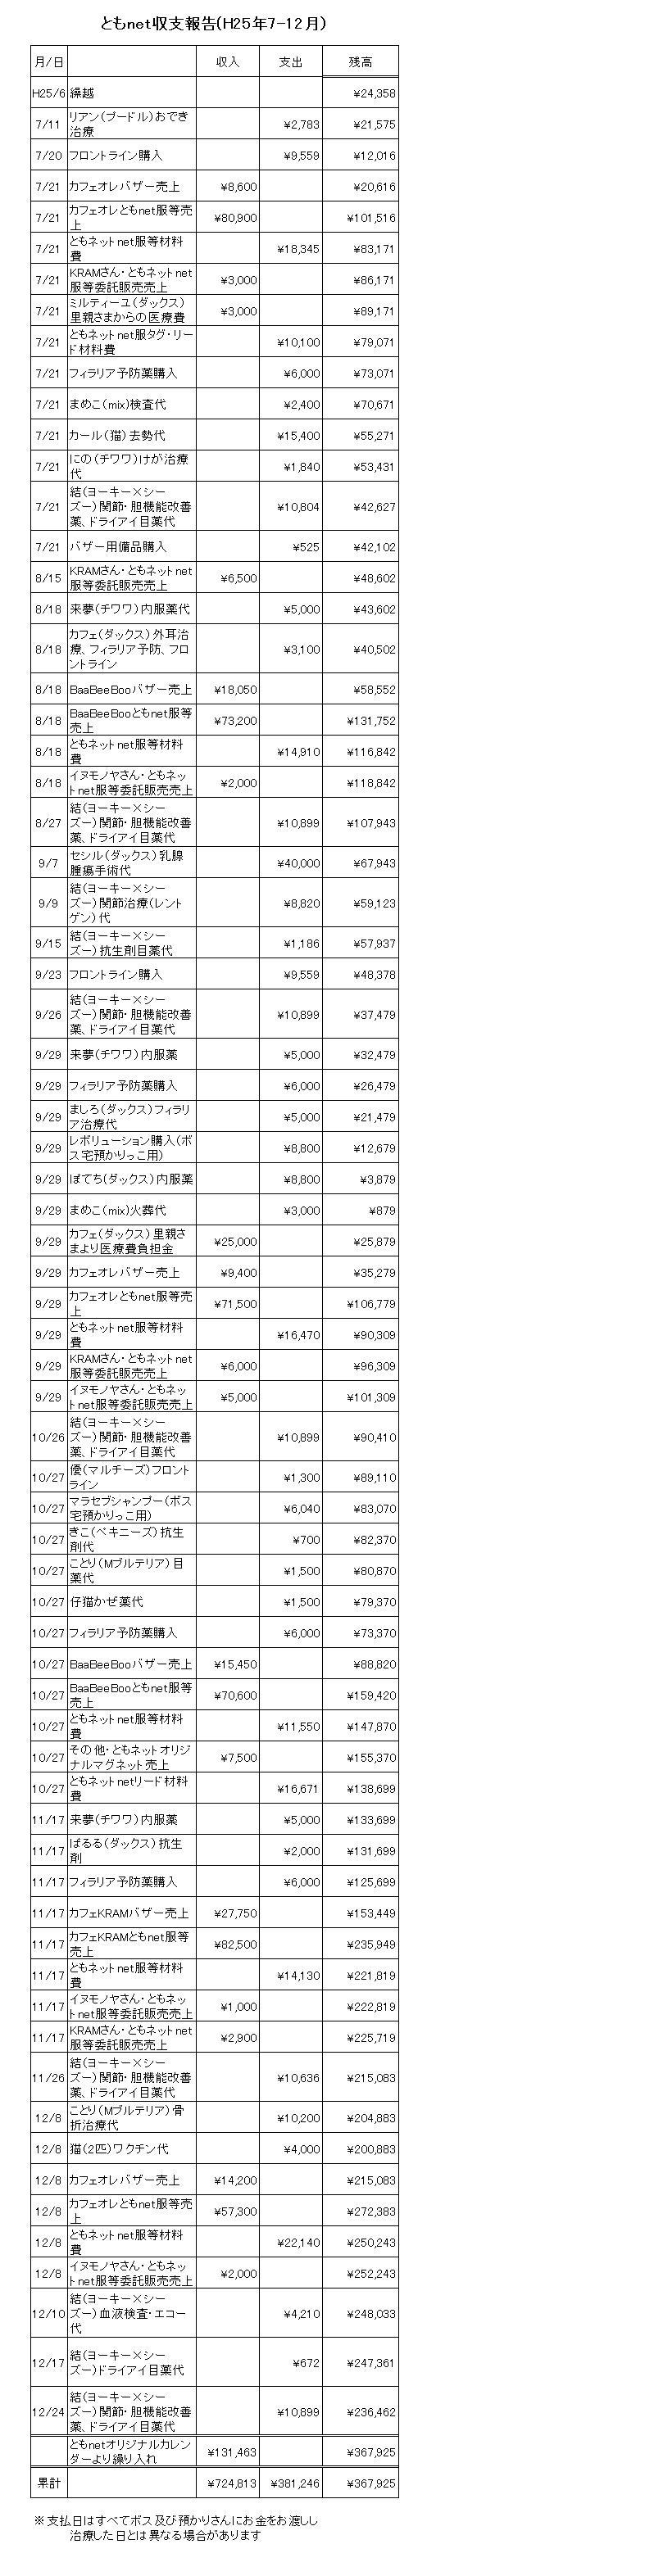 7-12収支報告